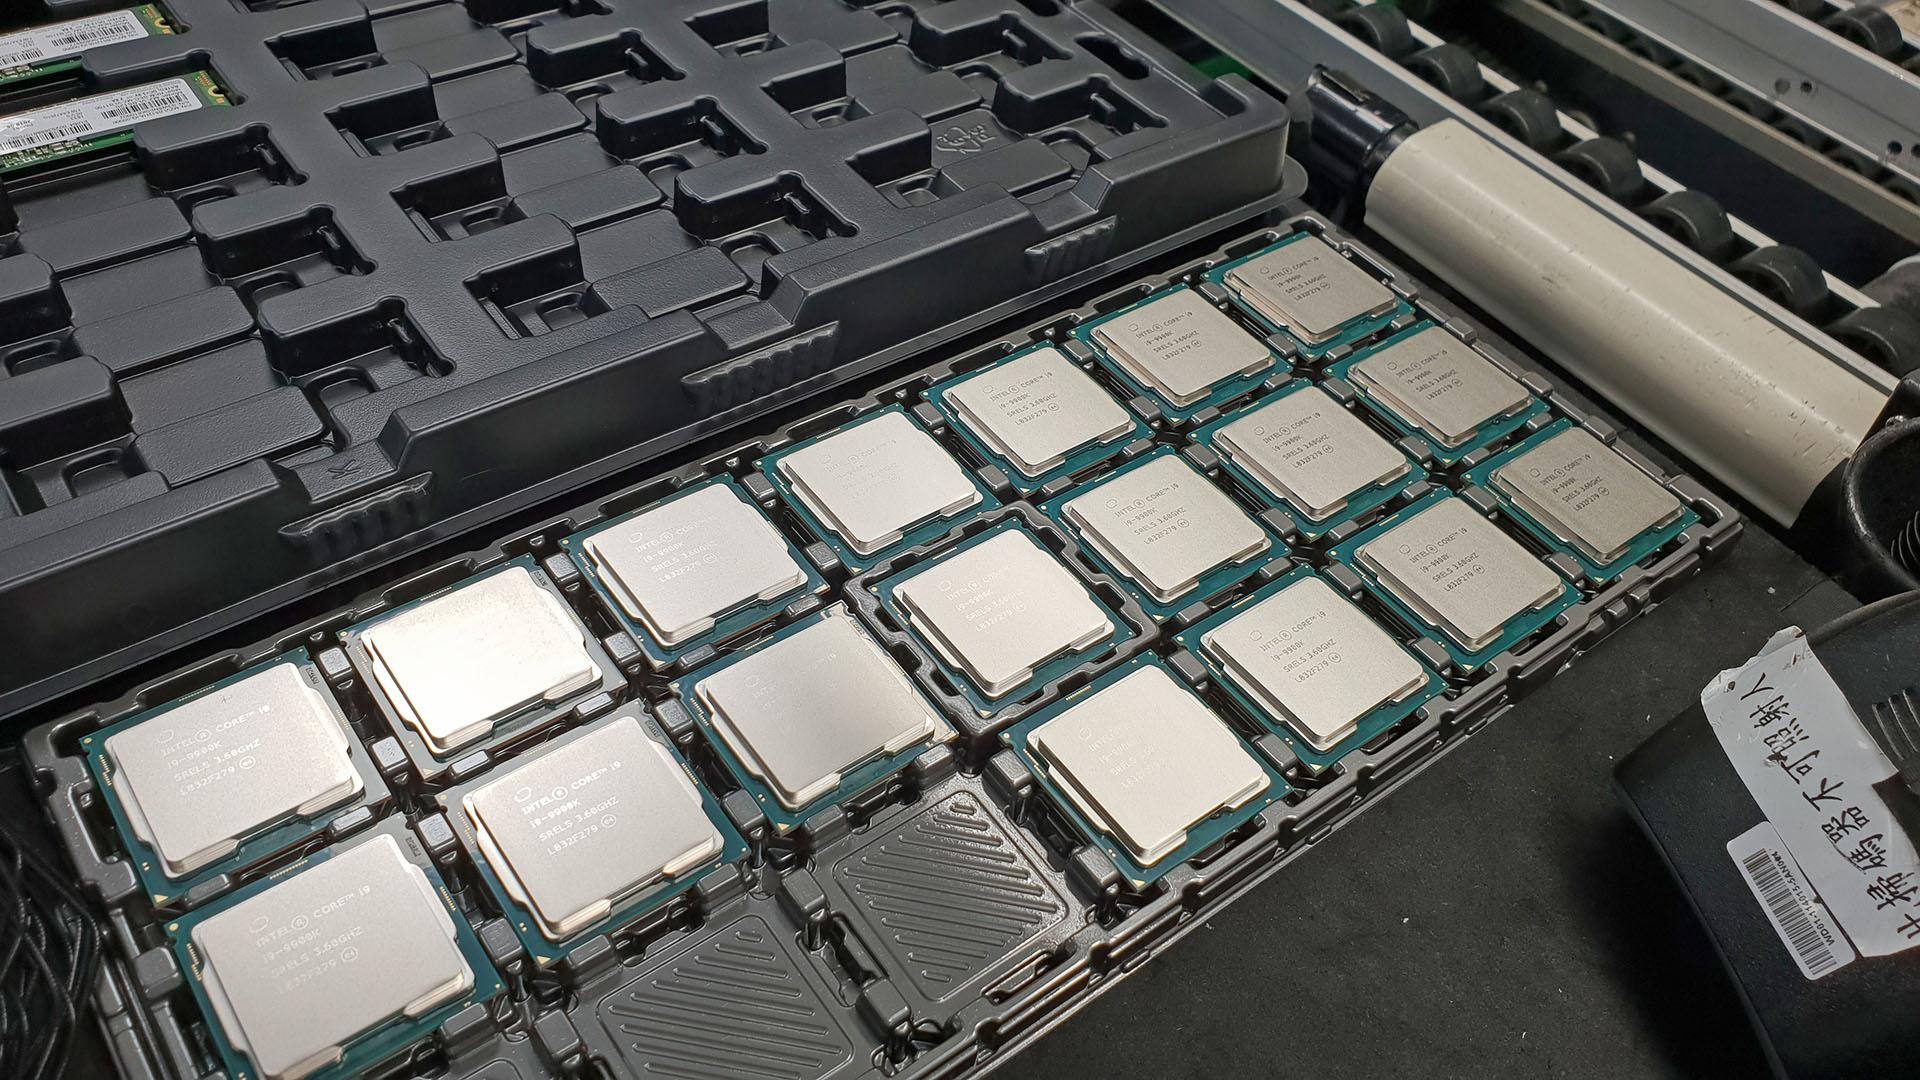 Test: Intel Core i9-9900K - Allround-PC com